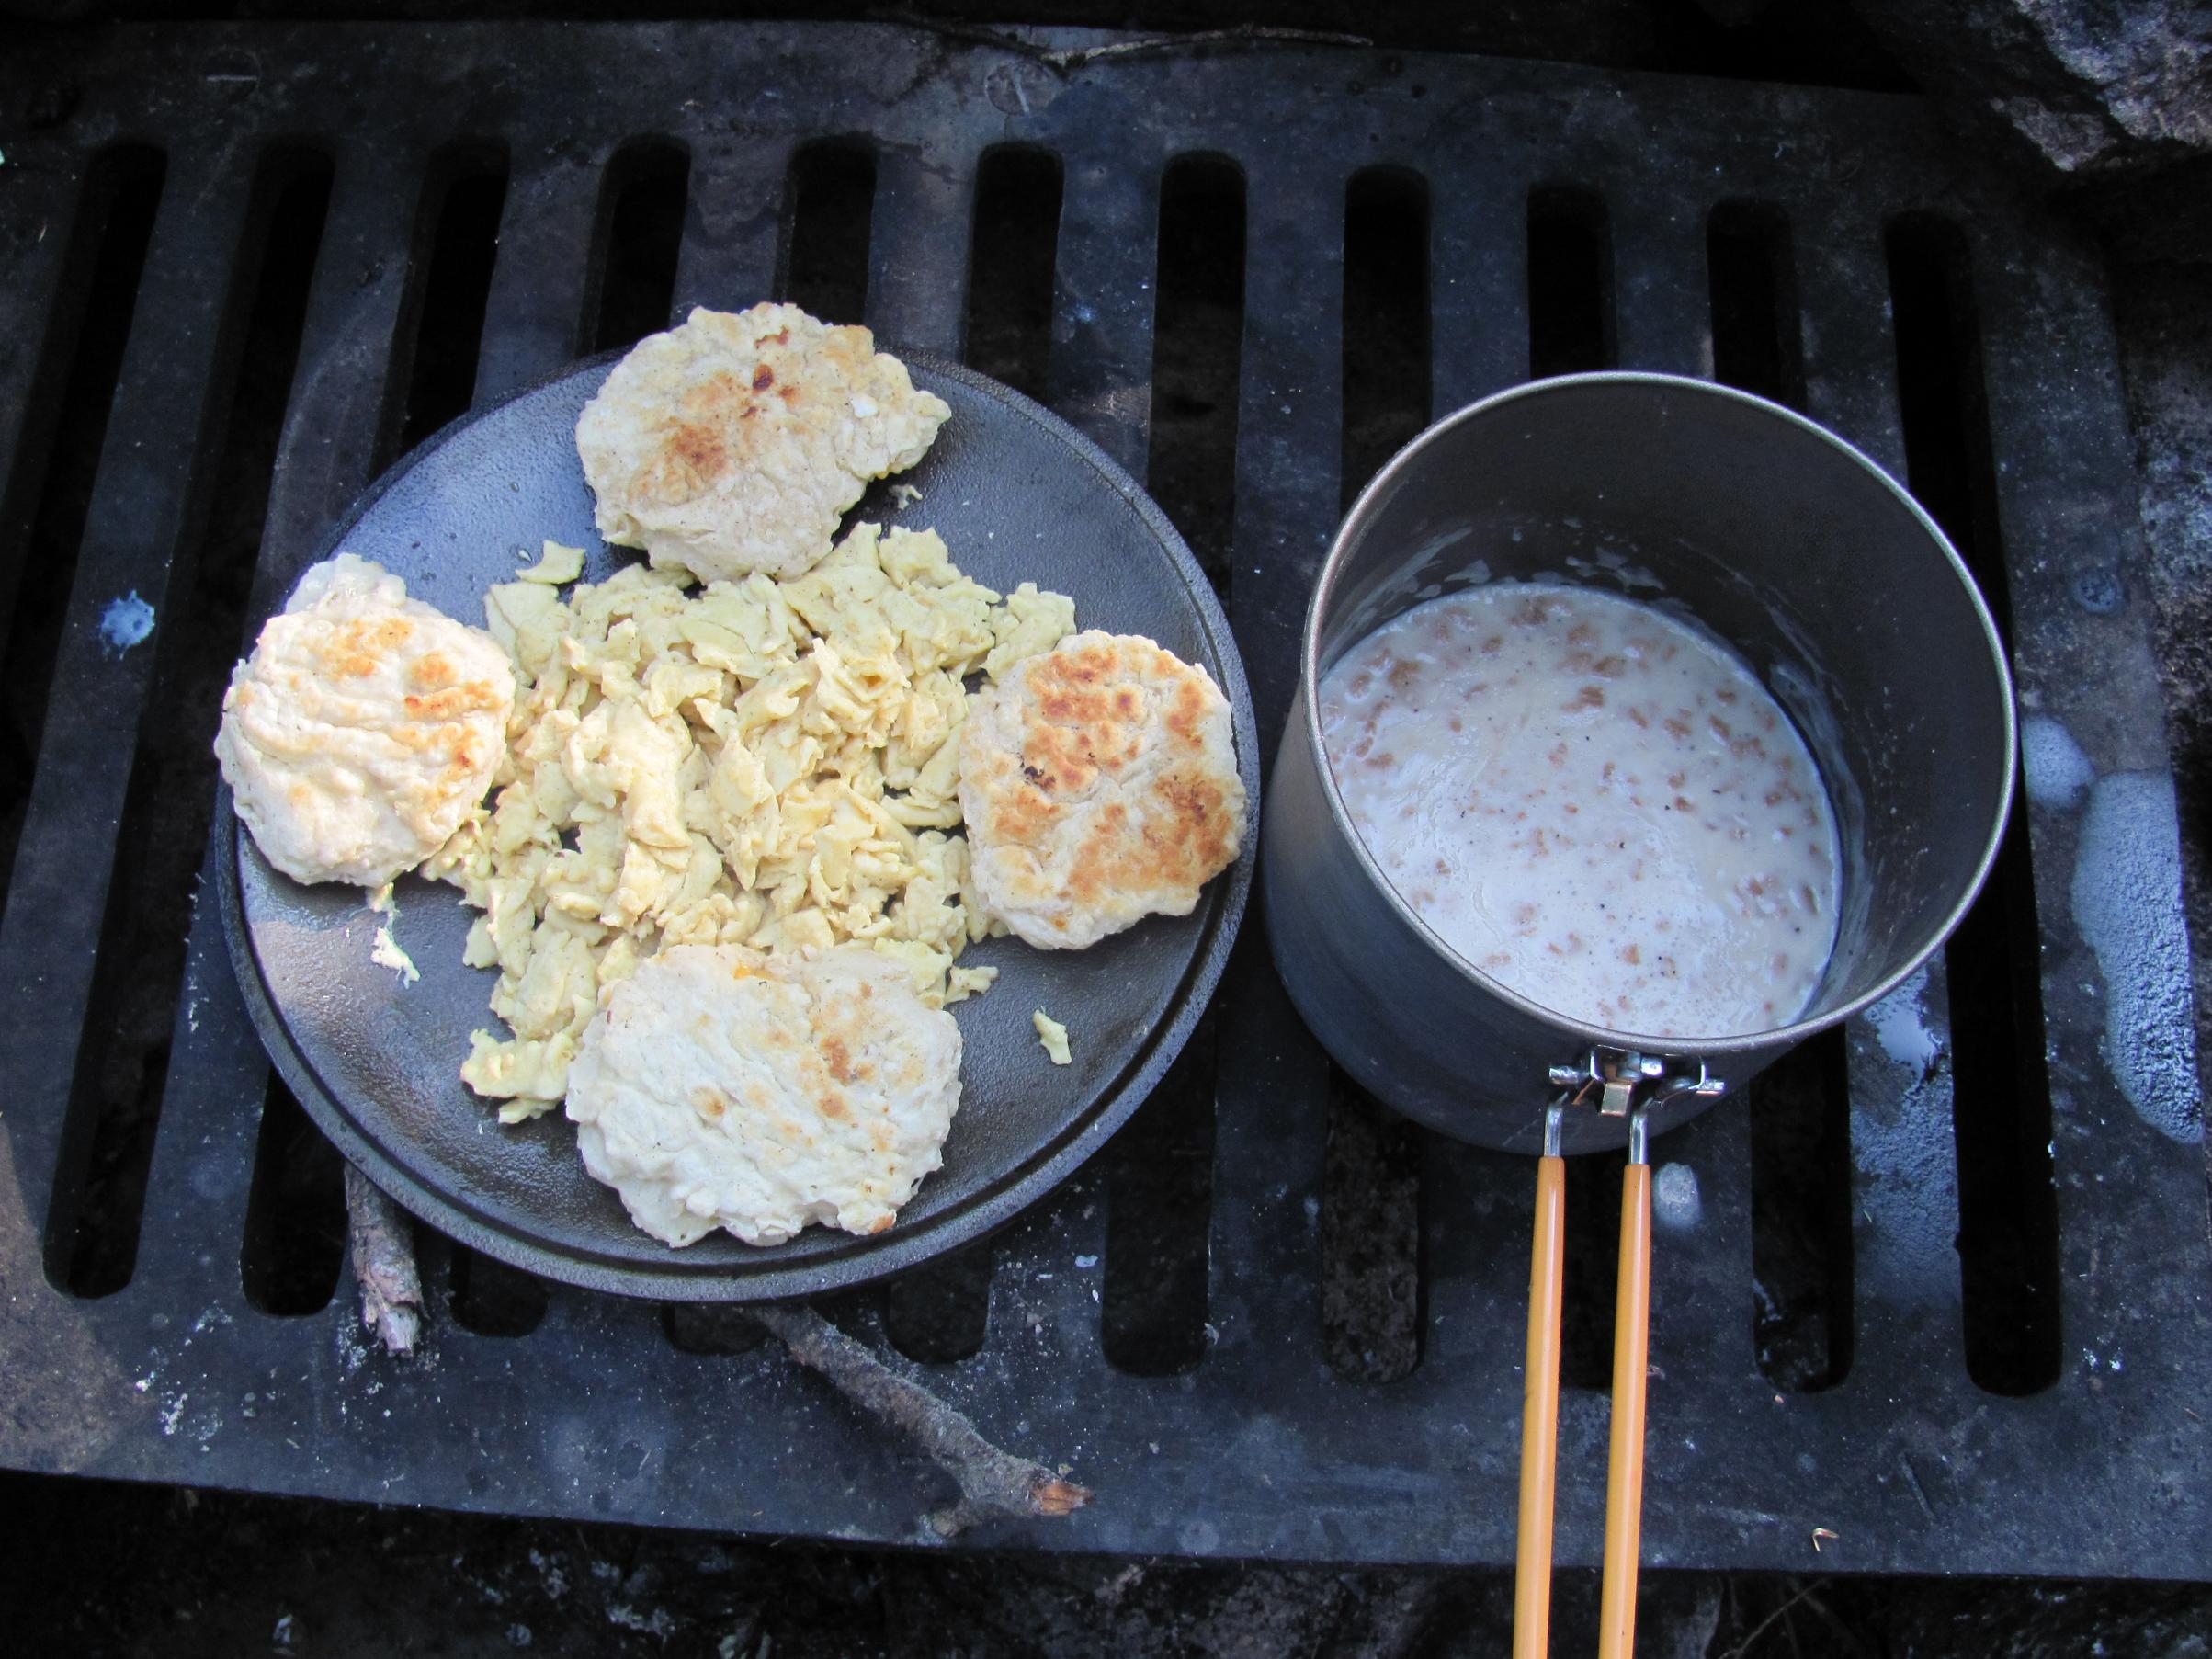 Biscuits 'n Gravy - Eggs